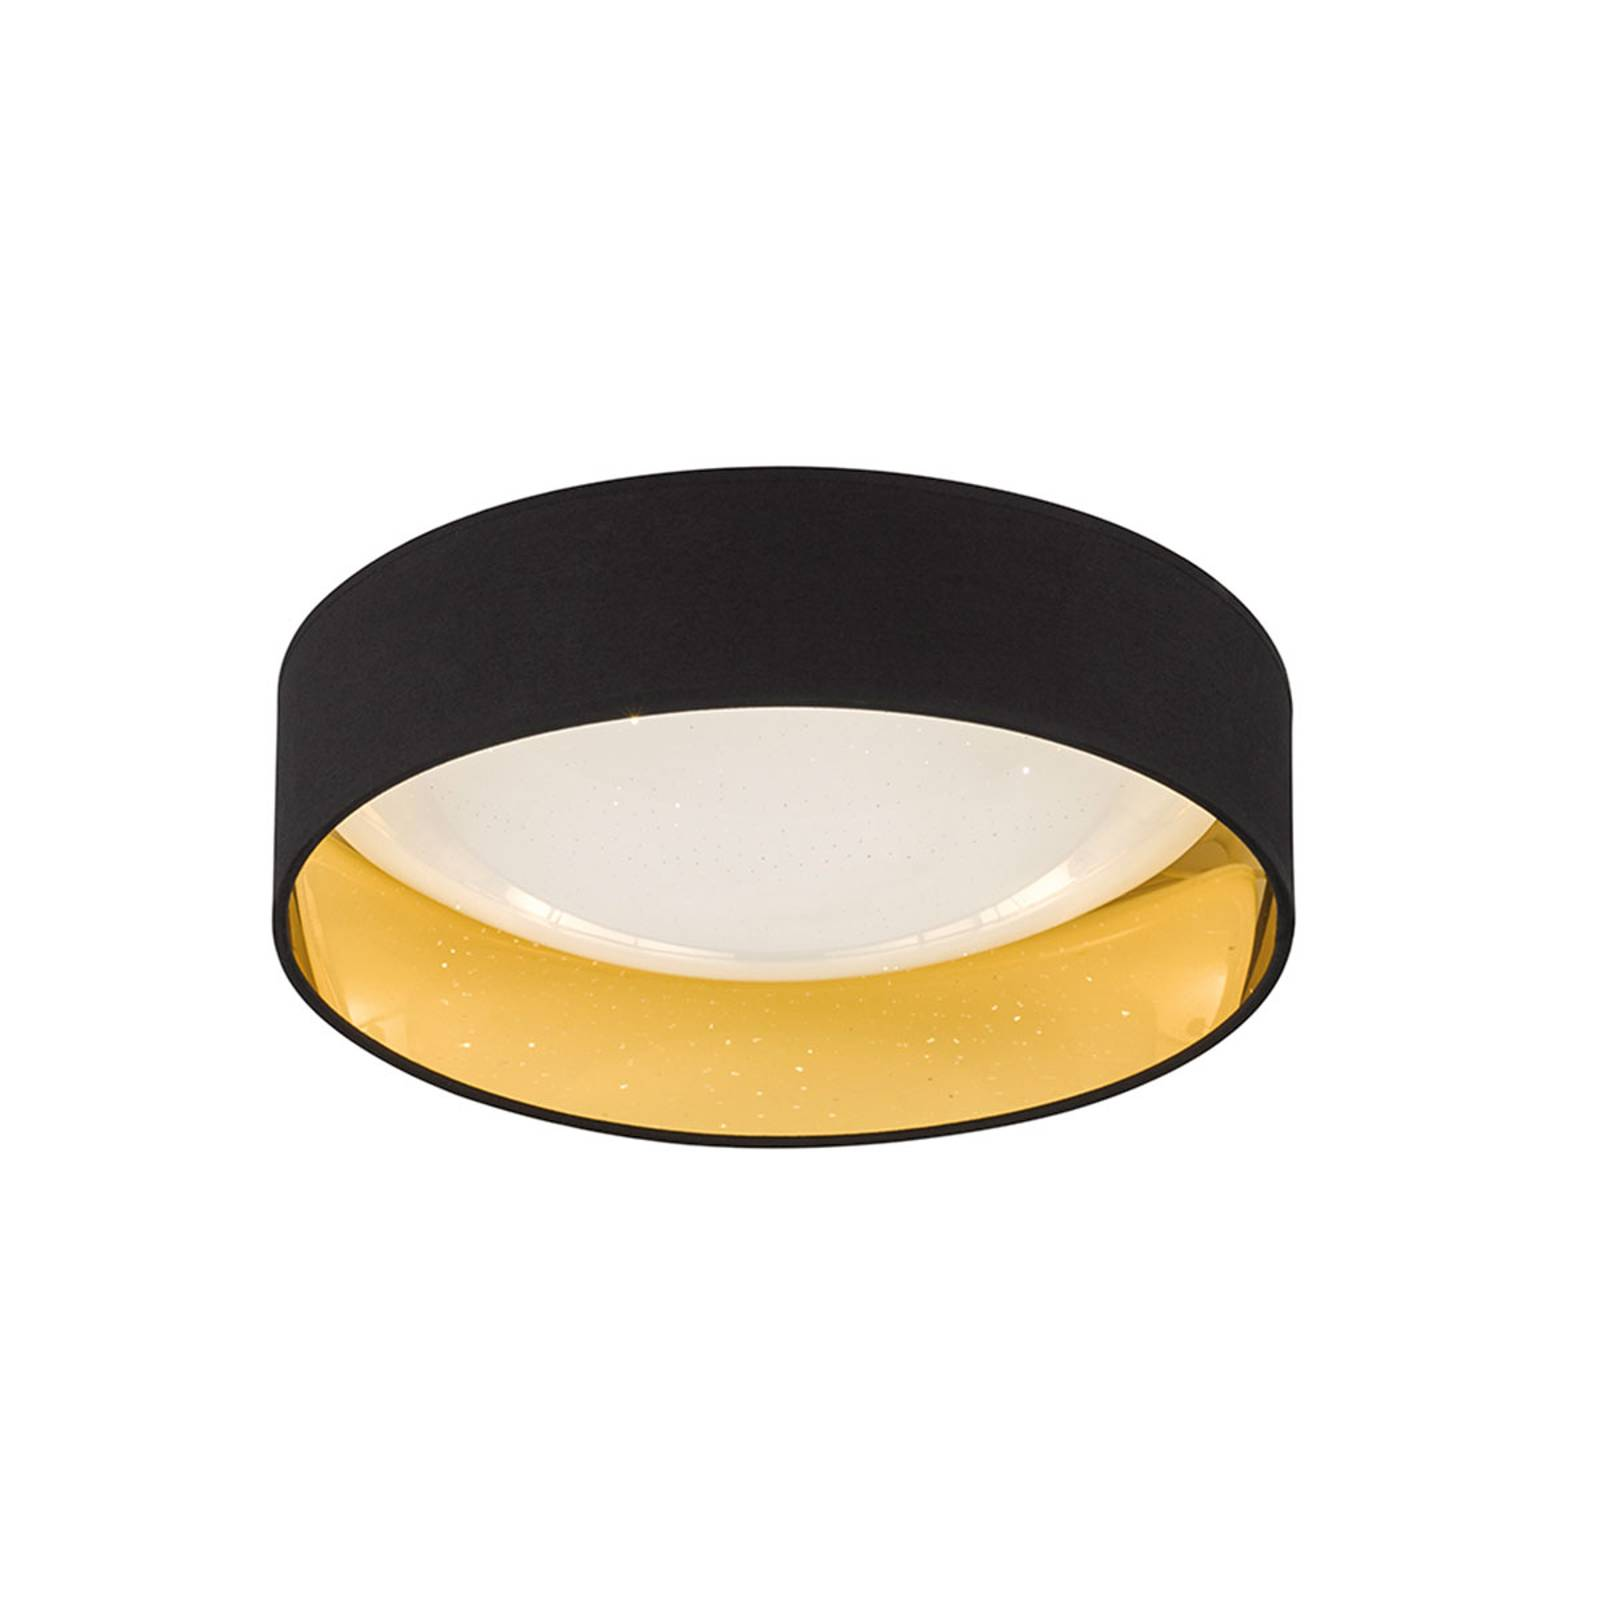 LED-kattovalaisin Sete Ø 40 cm, musta-kulta